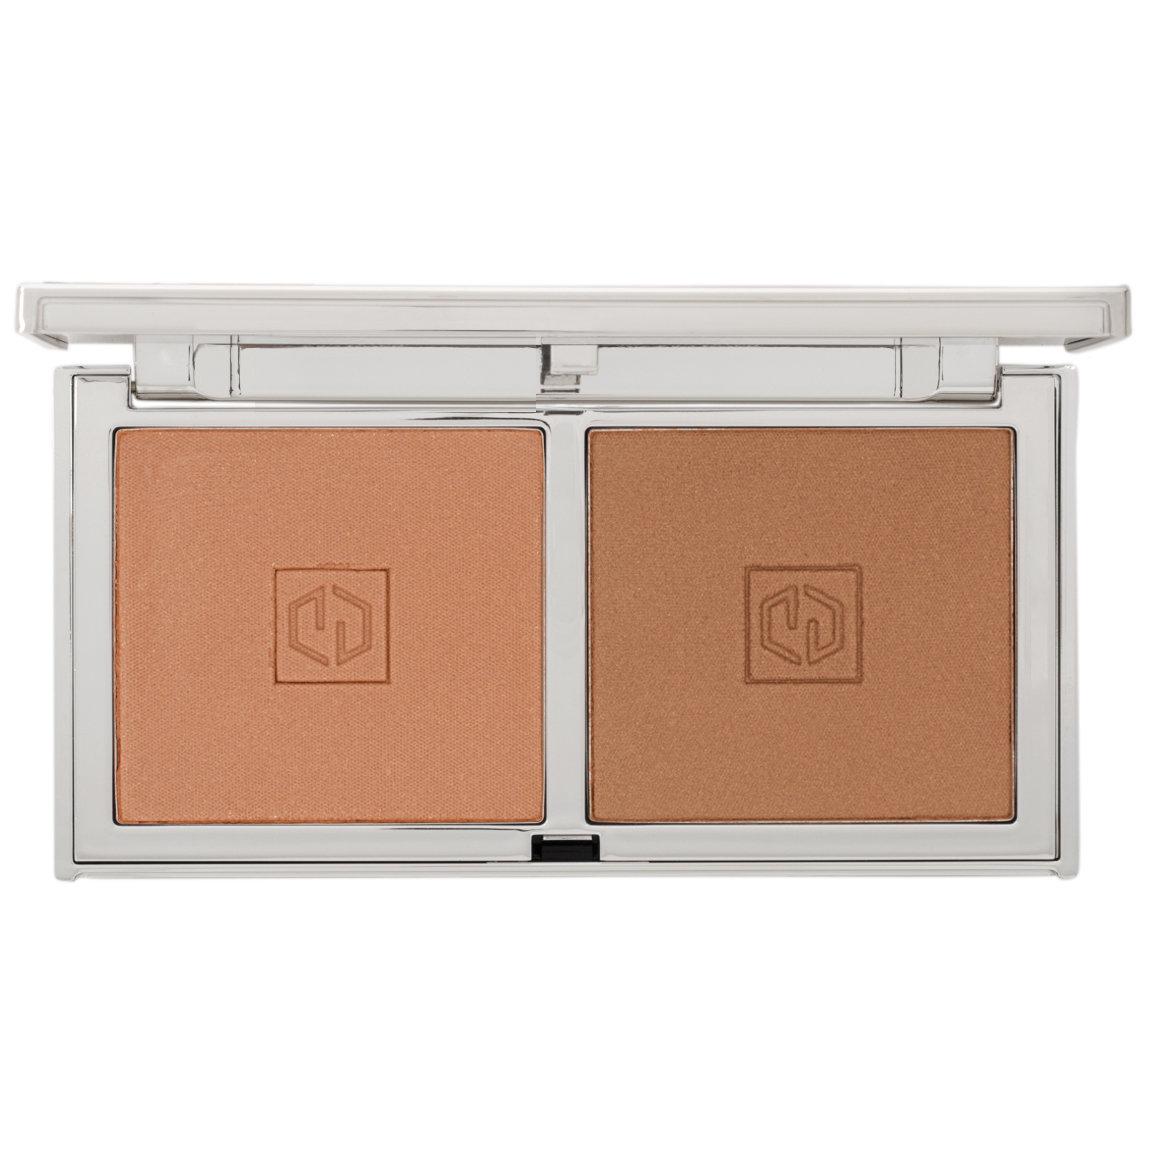 Jouer Cosmetics Sunswept Bronzer Duo Medium To Deep alternative view 1 - product swatch.